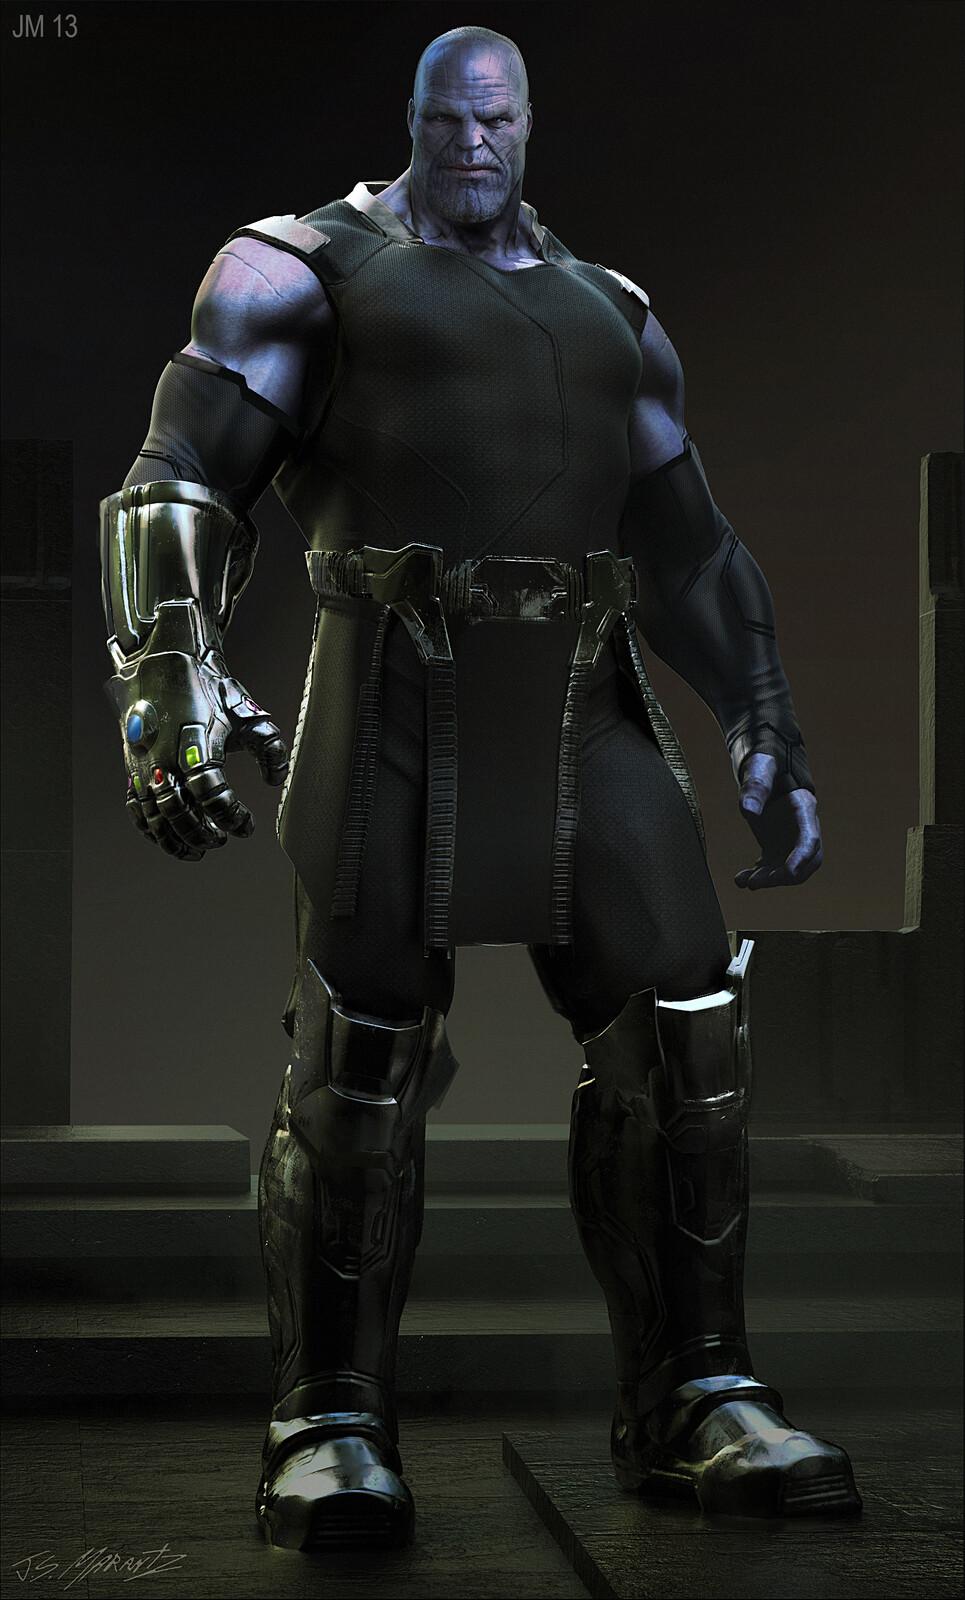 Avengers Infinity War: Thanos conceptart